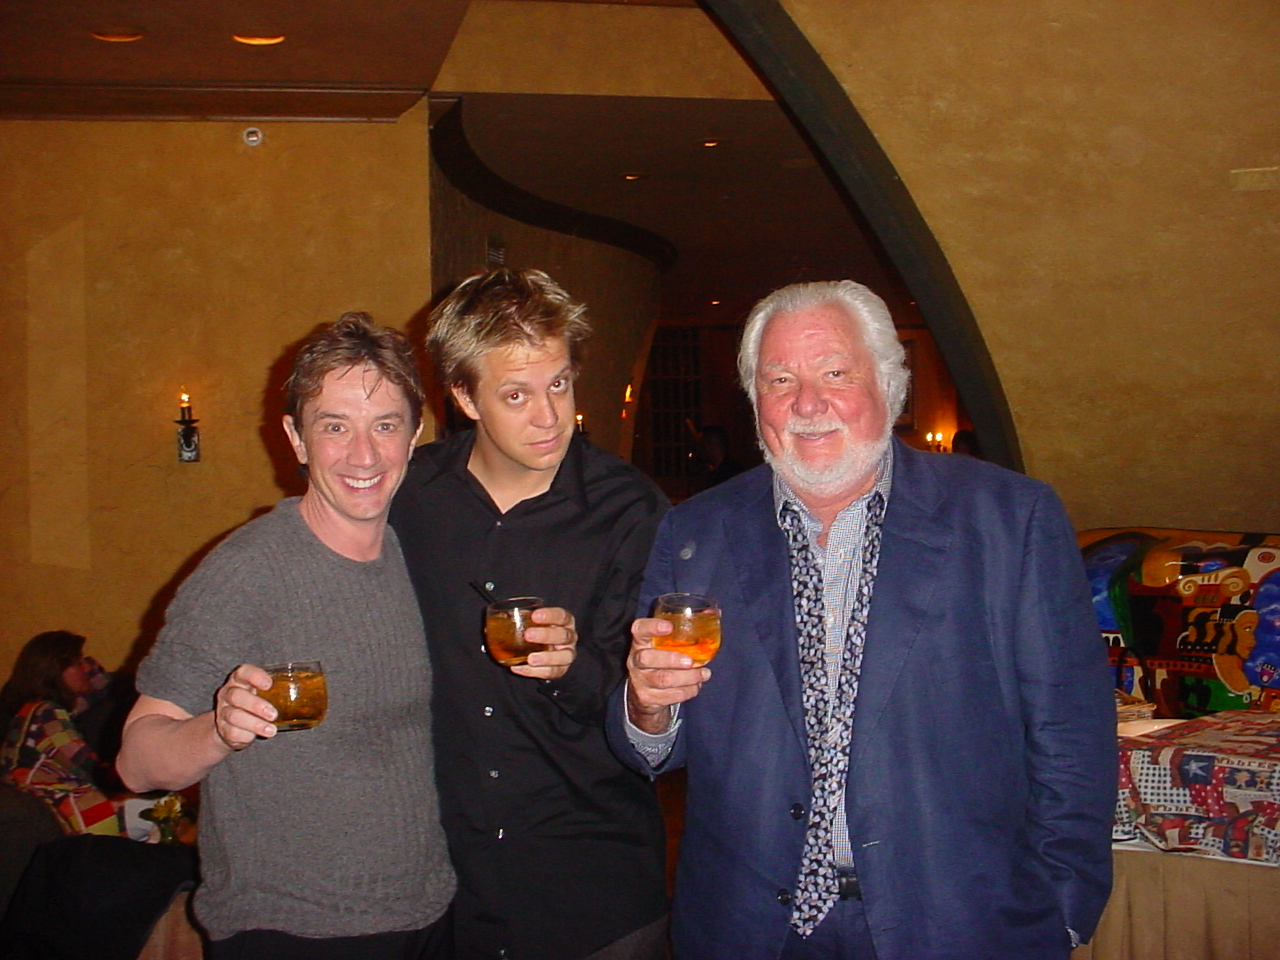 w/ Martin Short & legendary manager Bernie Brillstein after first touring live performace w/ Martin Short, Naperville, Illinois 2001